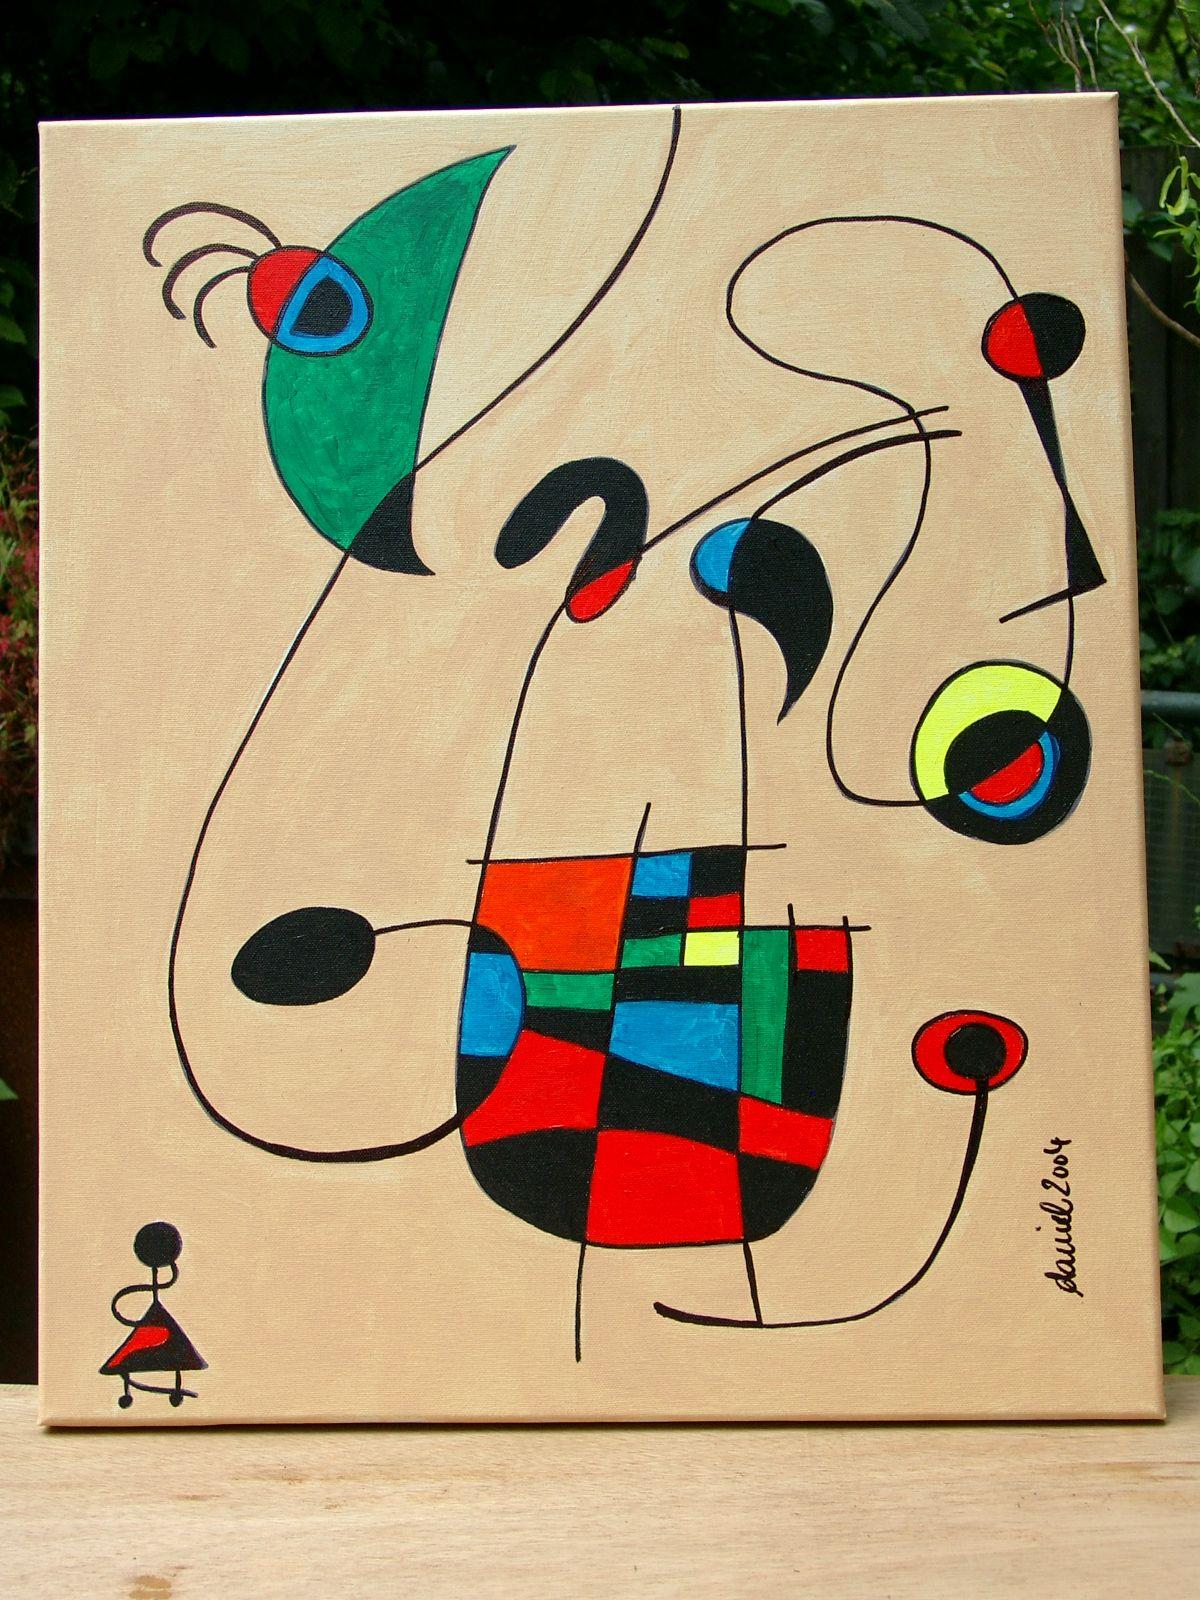 Homage an Miro | Peintures miro, Tableau peinture, Peinture